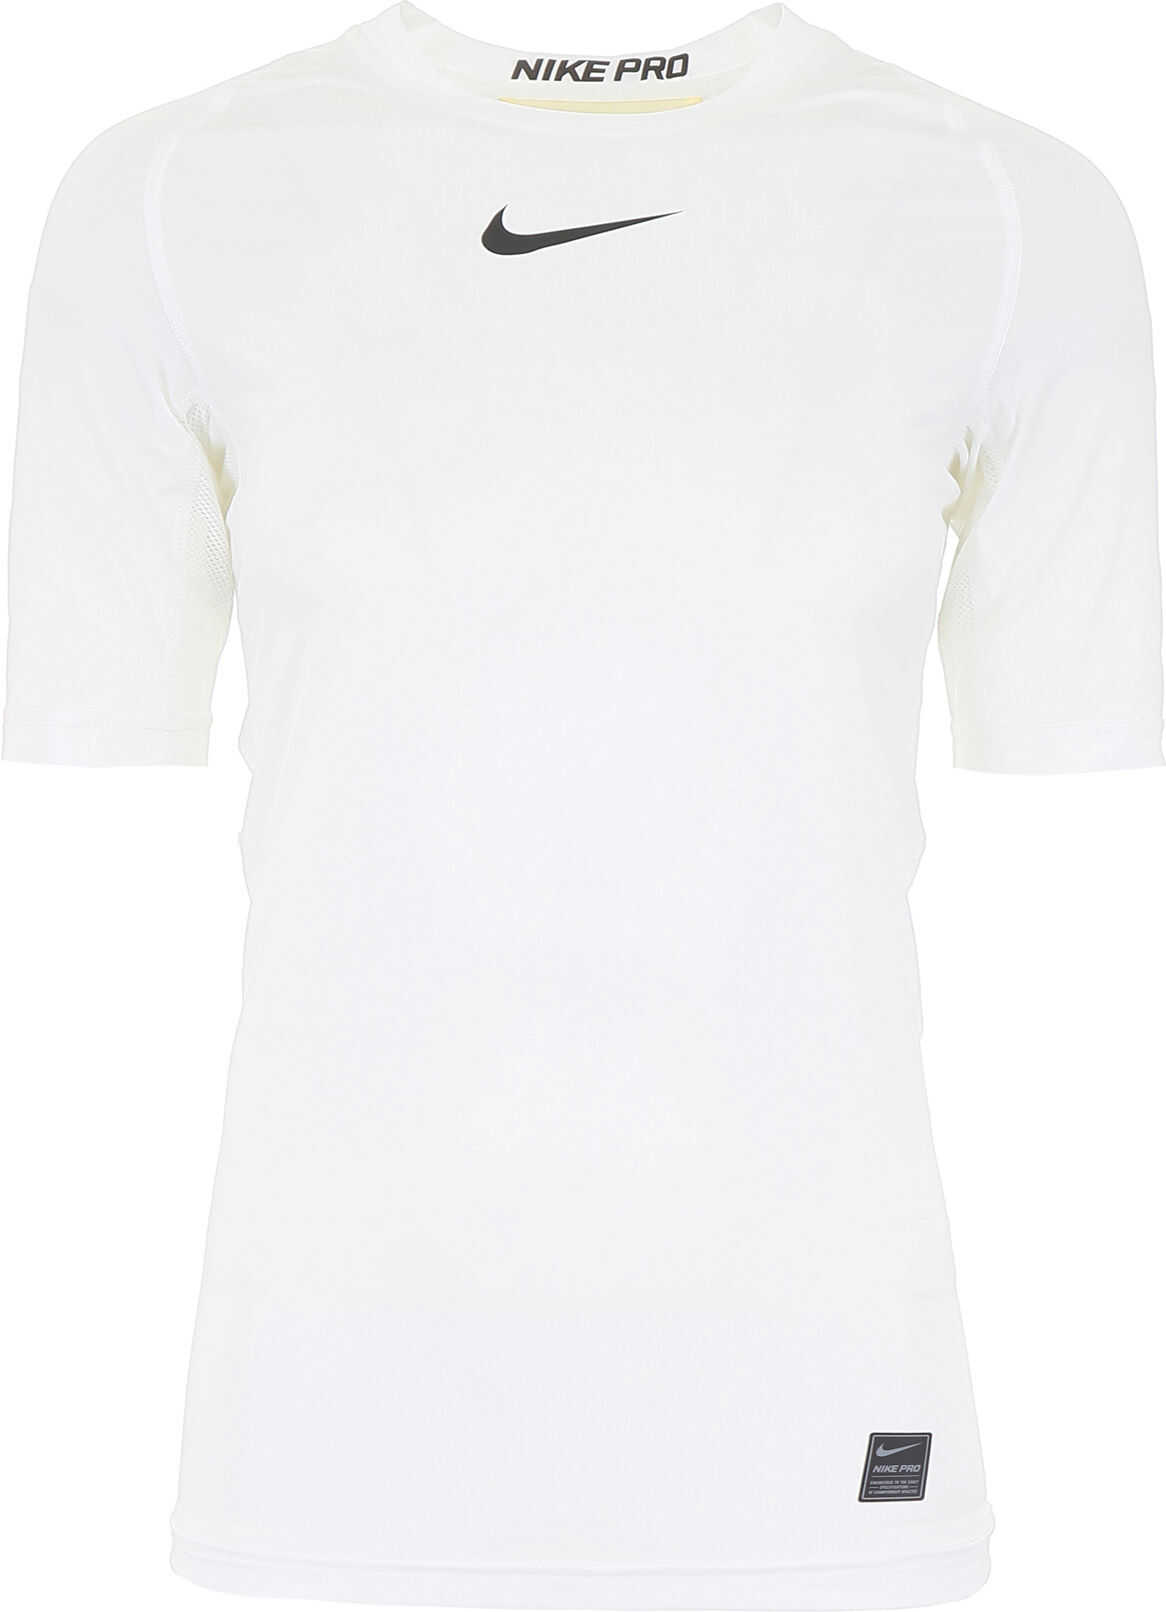 Alyx 1017 9Sm Nike Logo T-Shirt WHITE